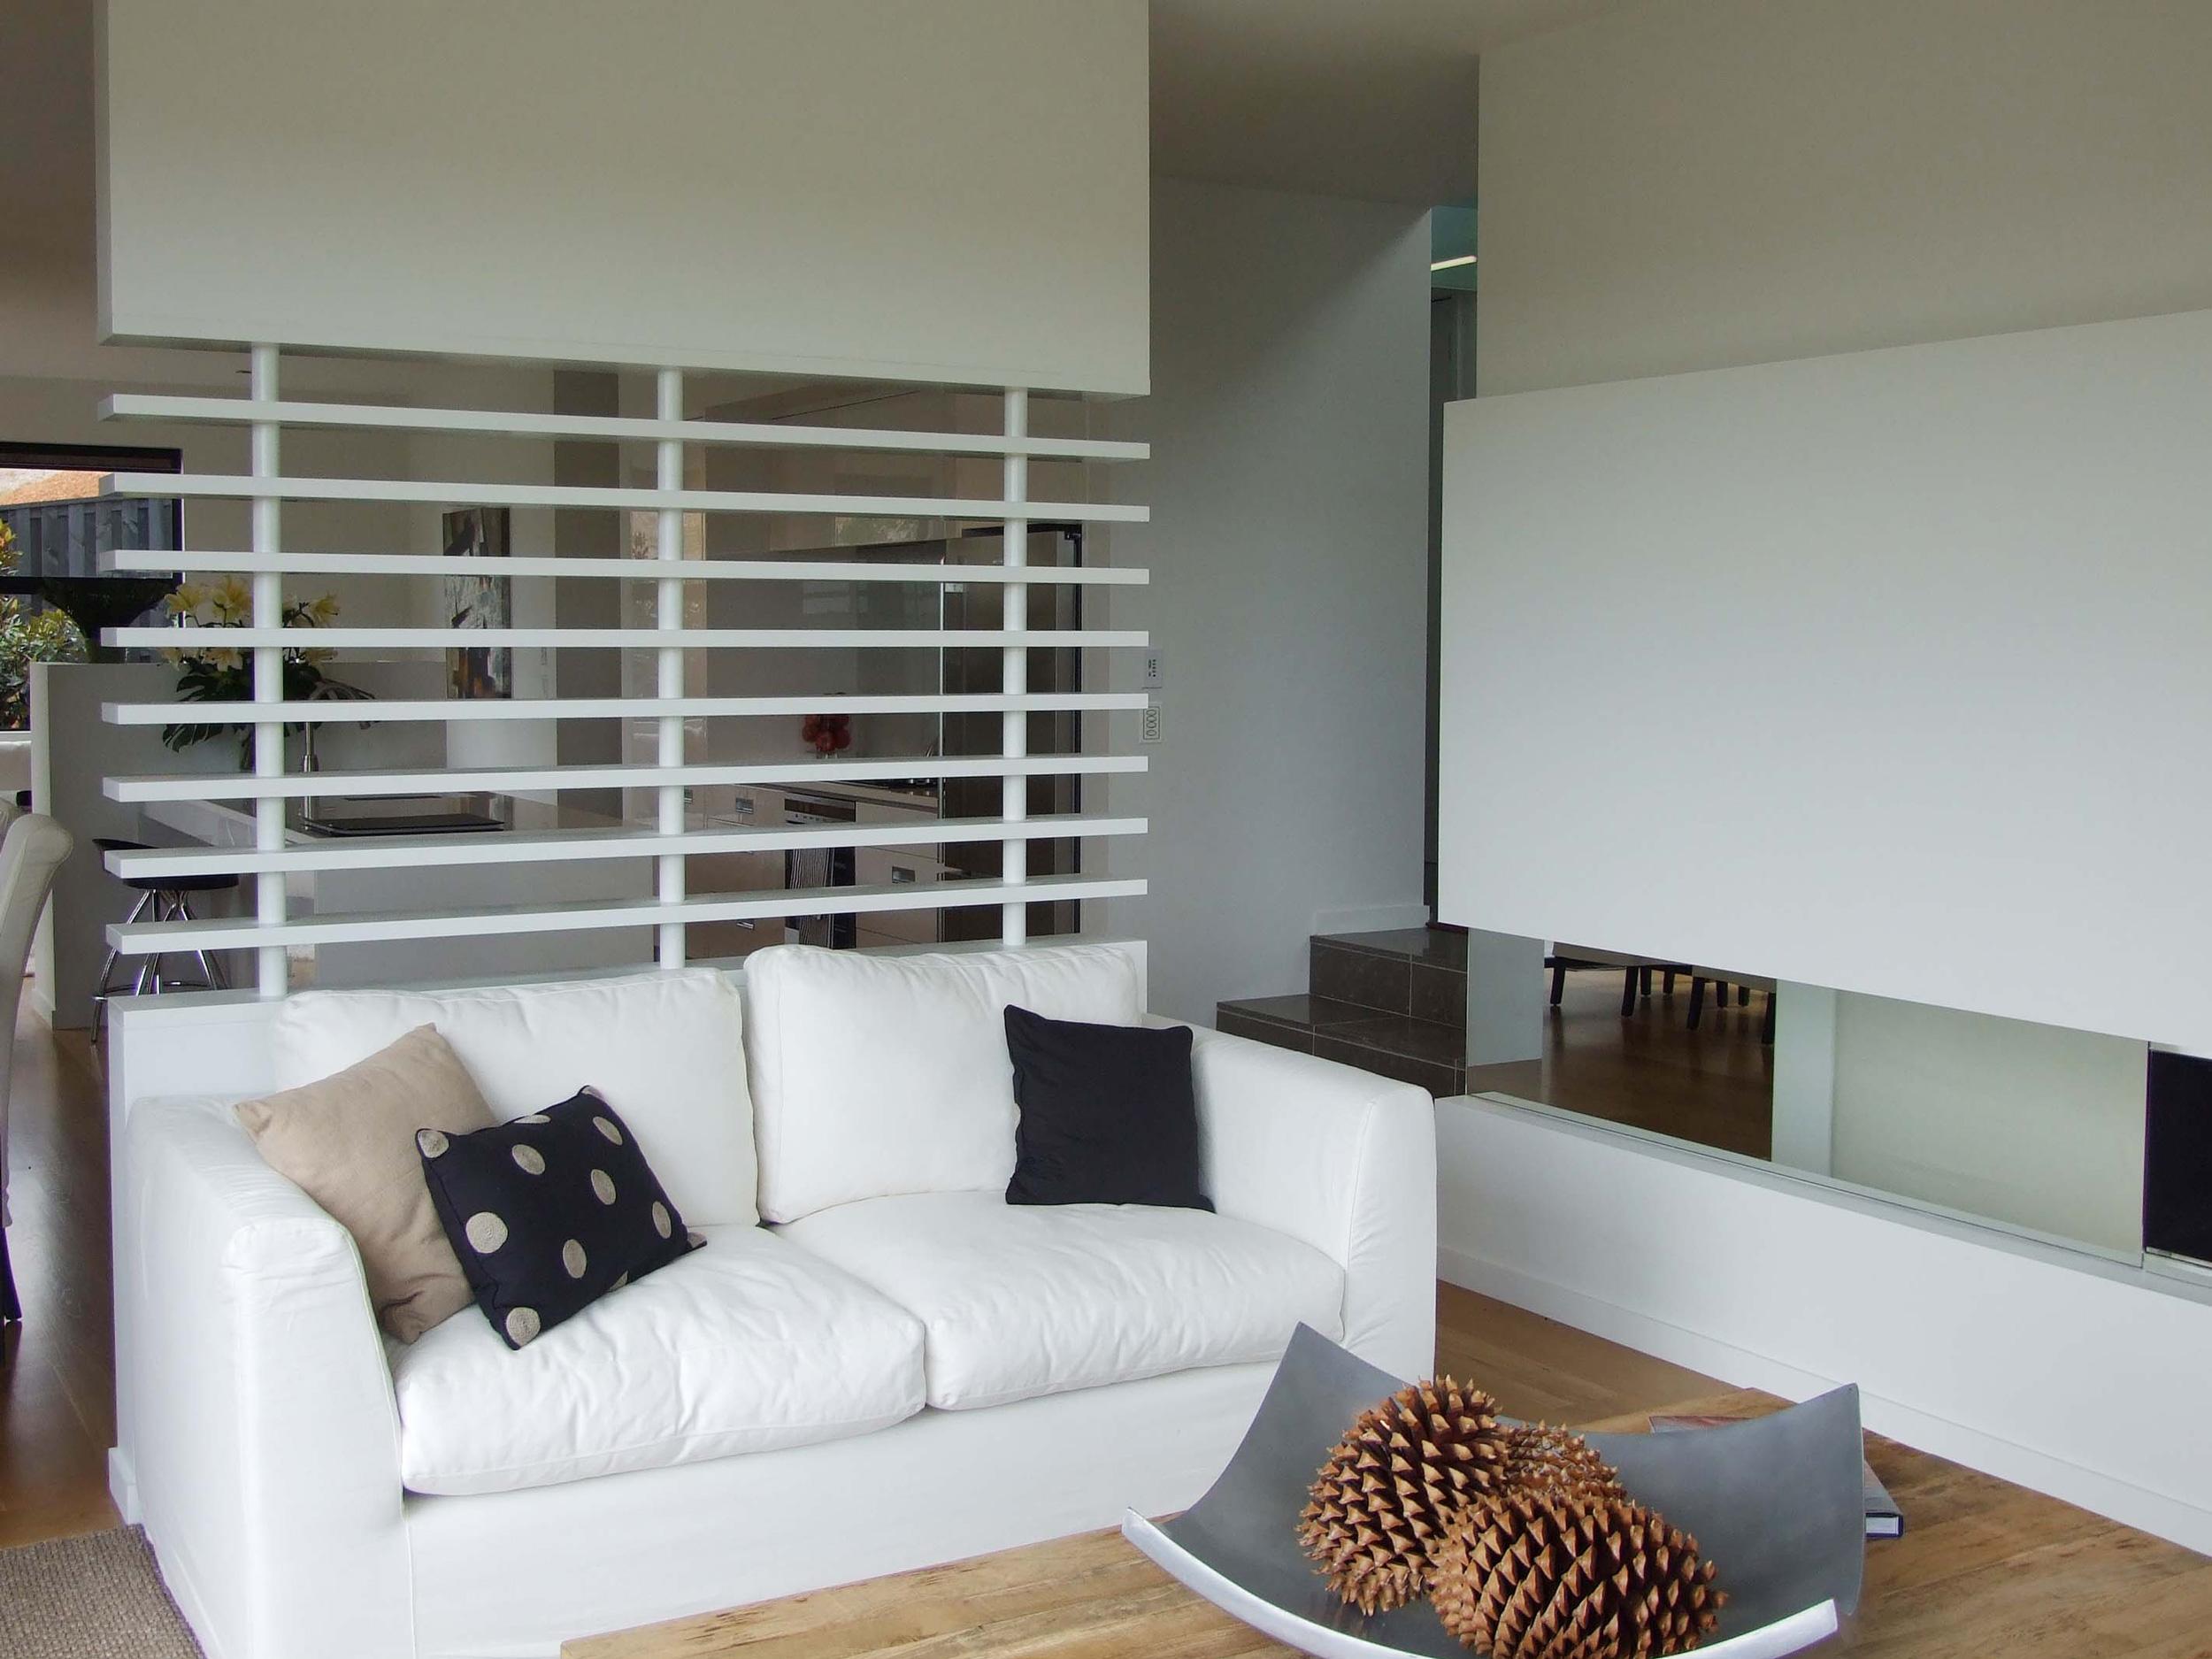 haven-builder-residential-anselmi-ridge-3.jpg